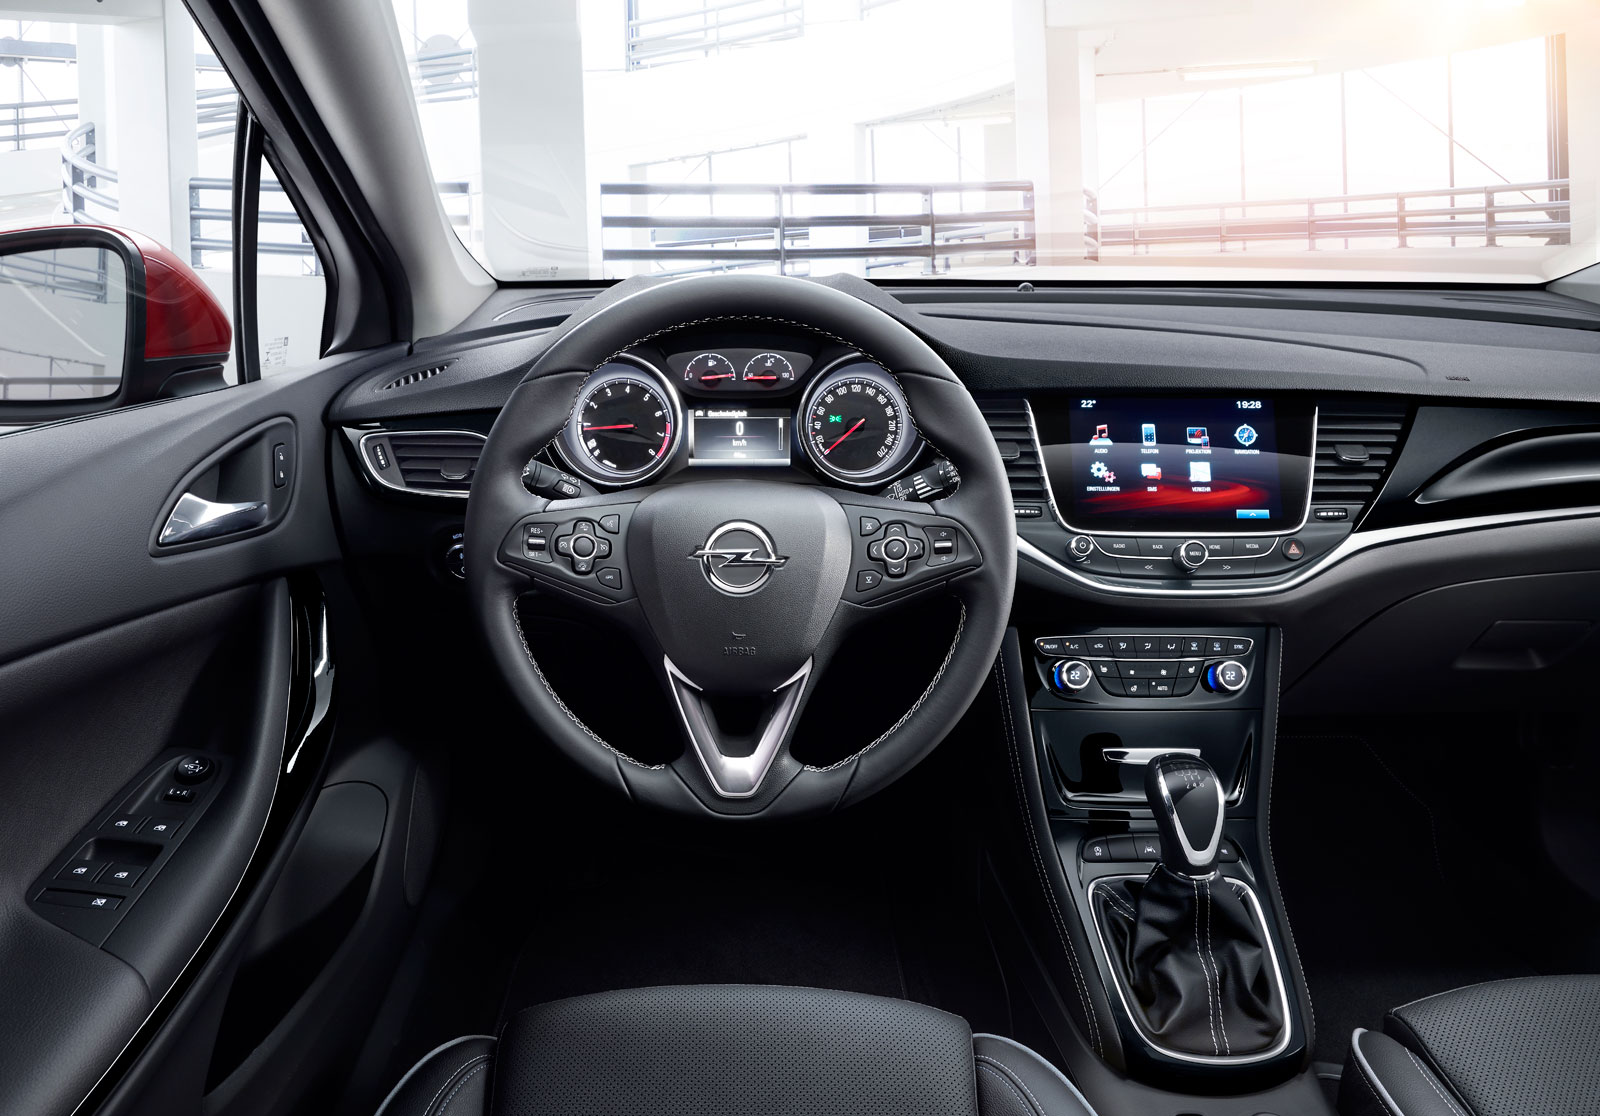 2016 Opel Astra - Interior - Car Body Design